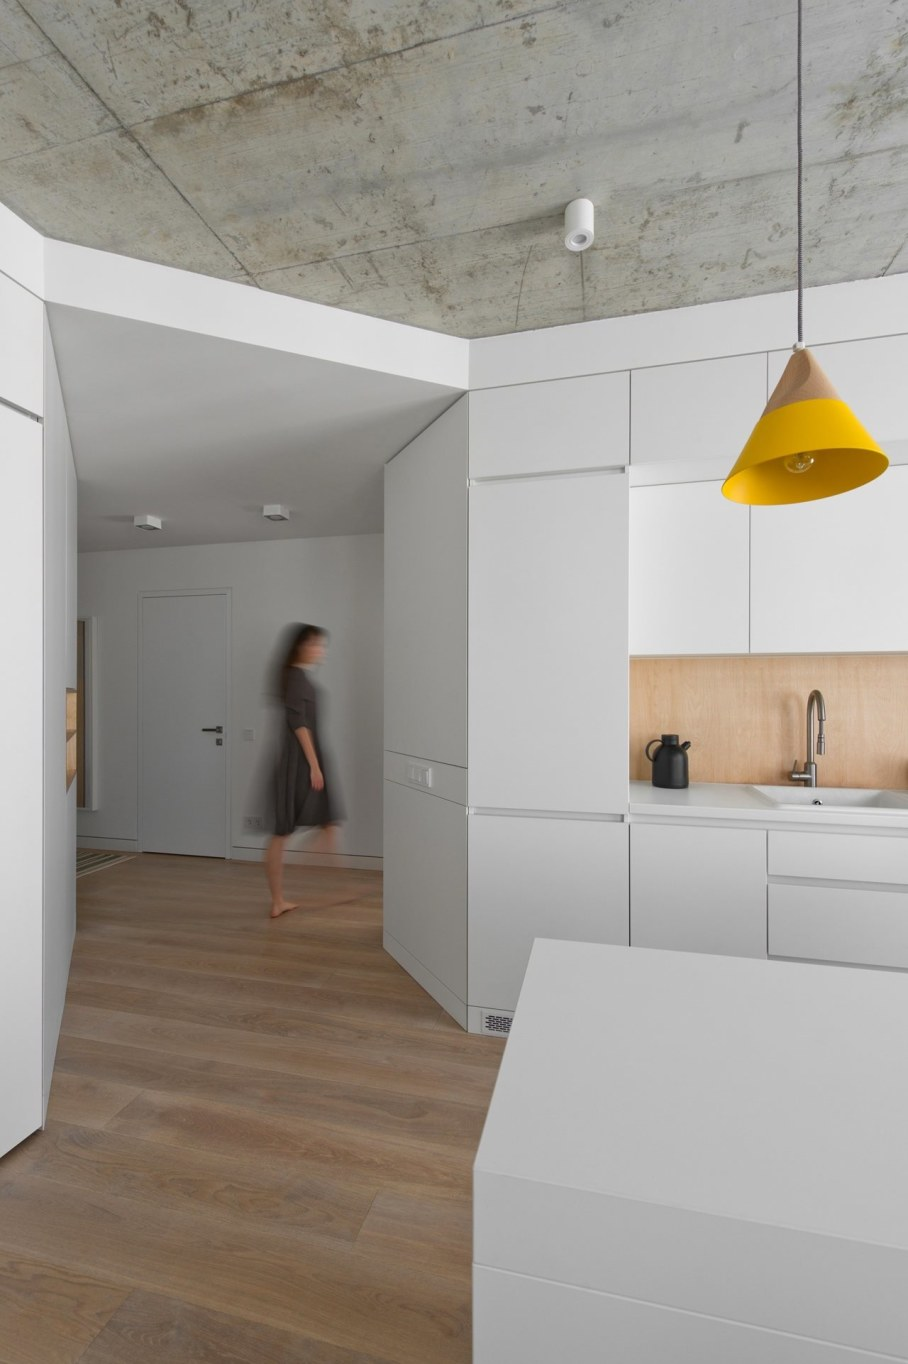 Apartment In Vilnius from Normundas Vilkas - Design ideas